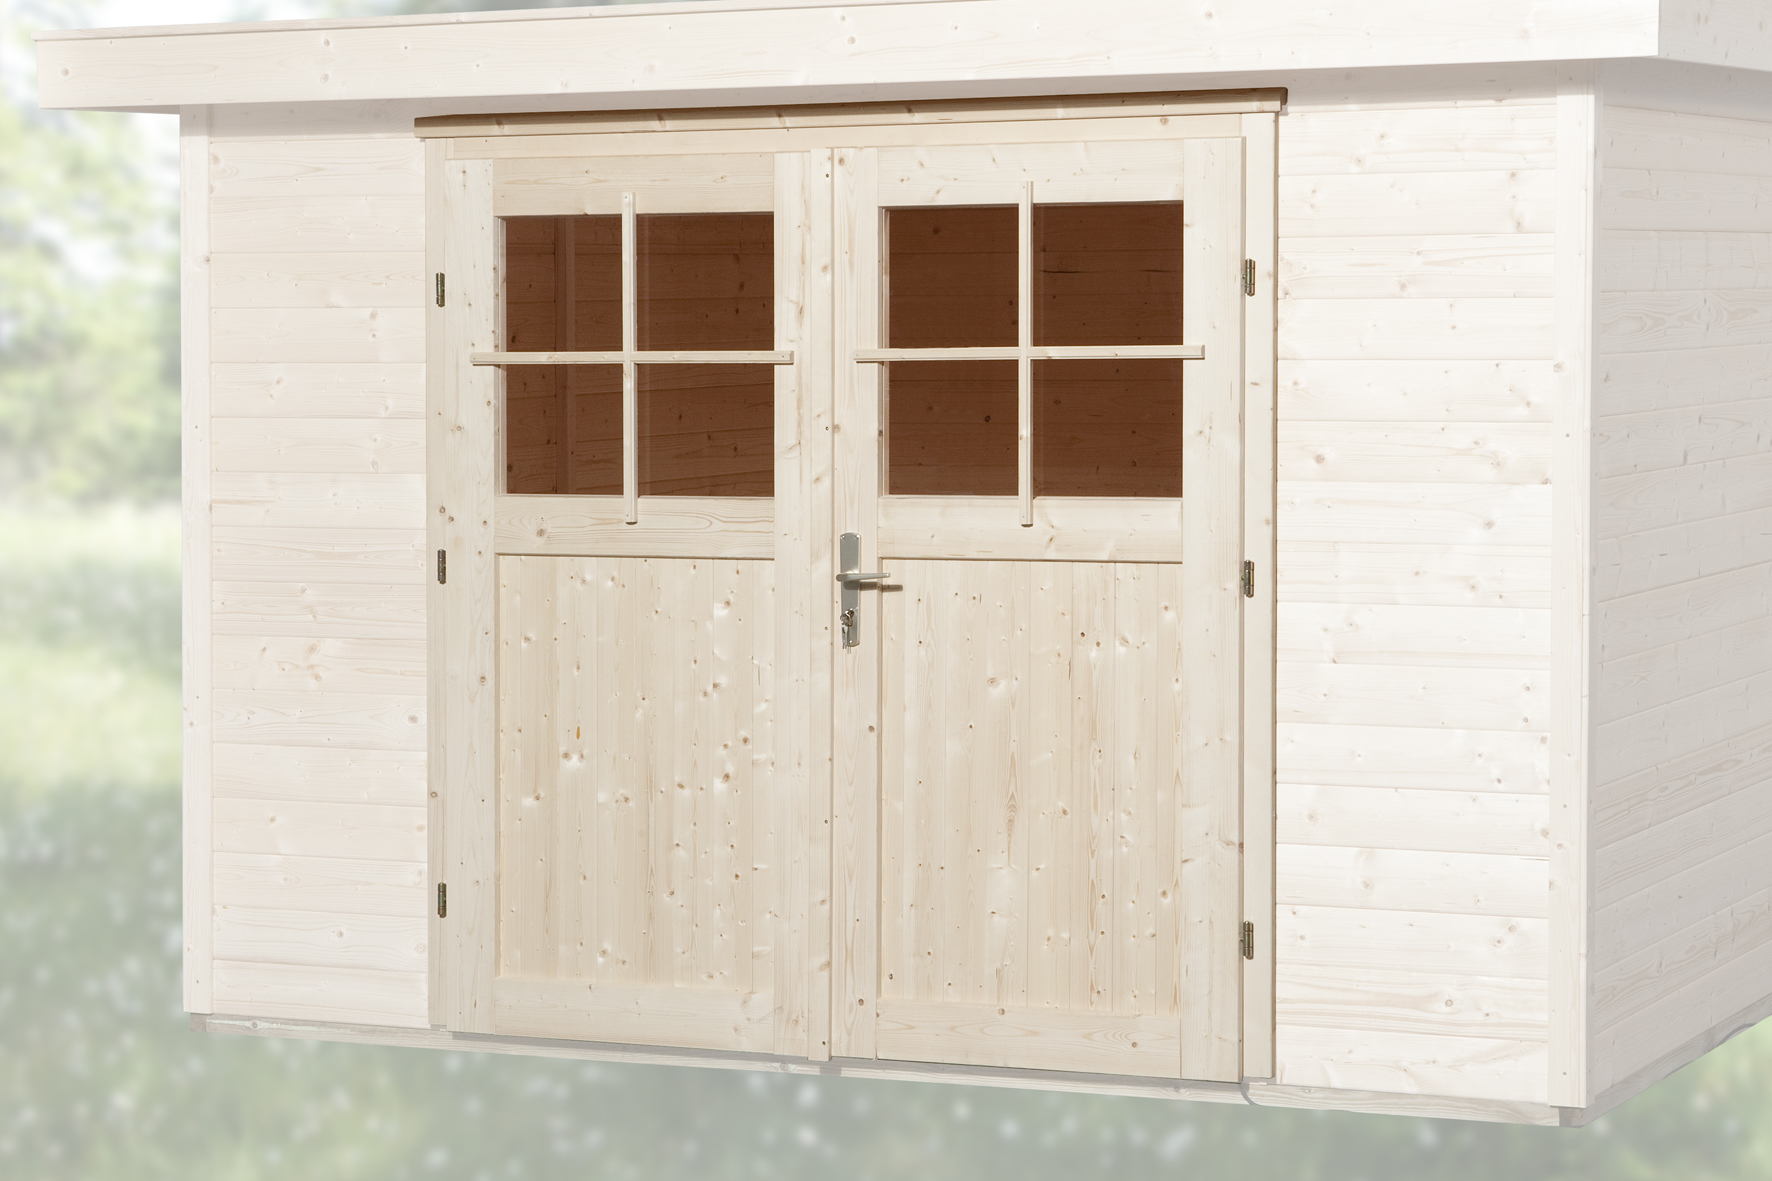 Douglas hout > Douglas deuren